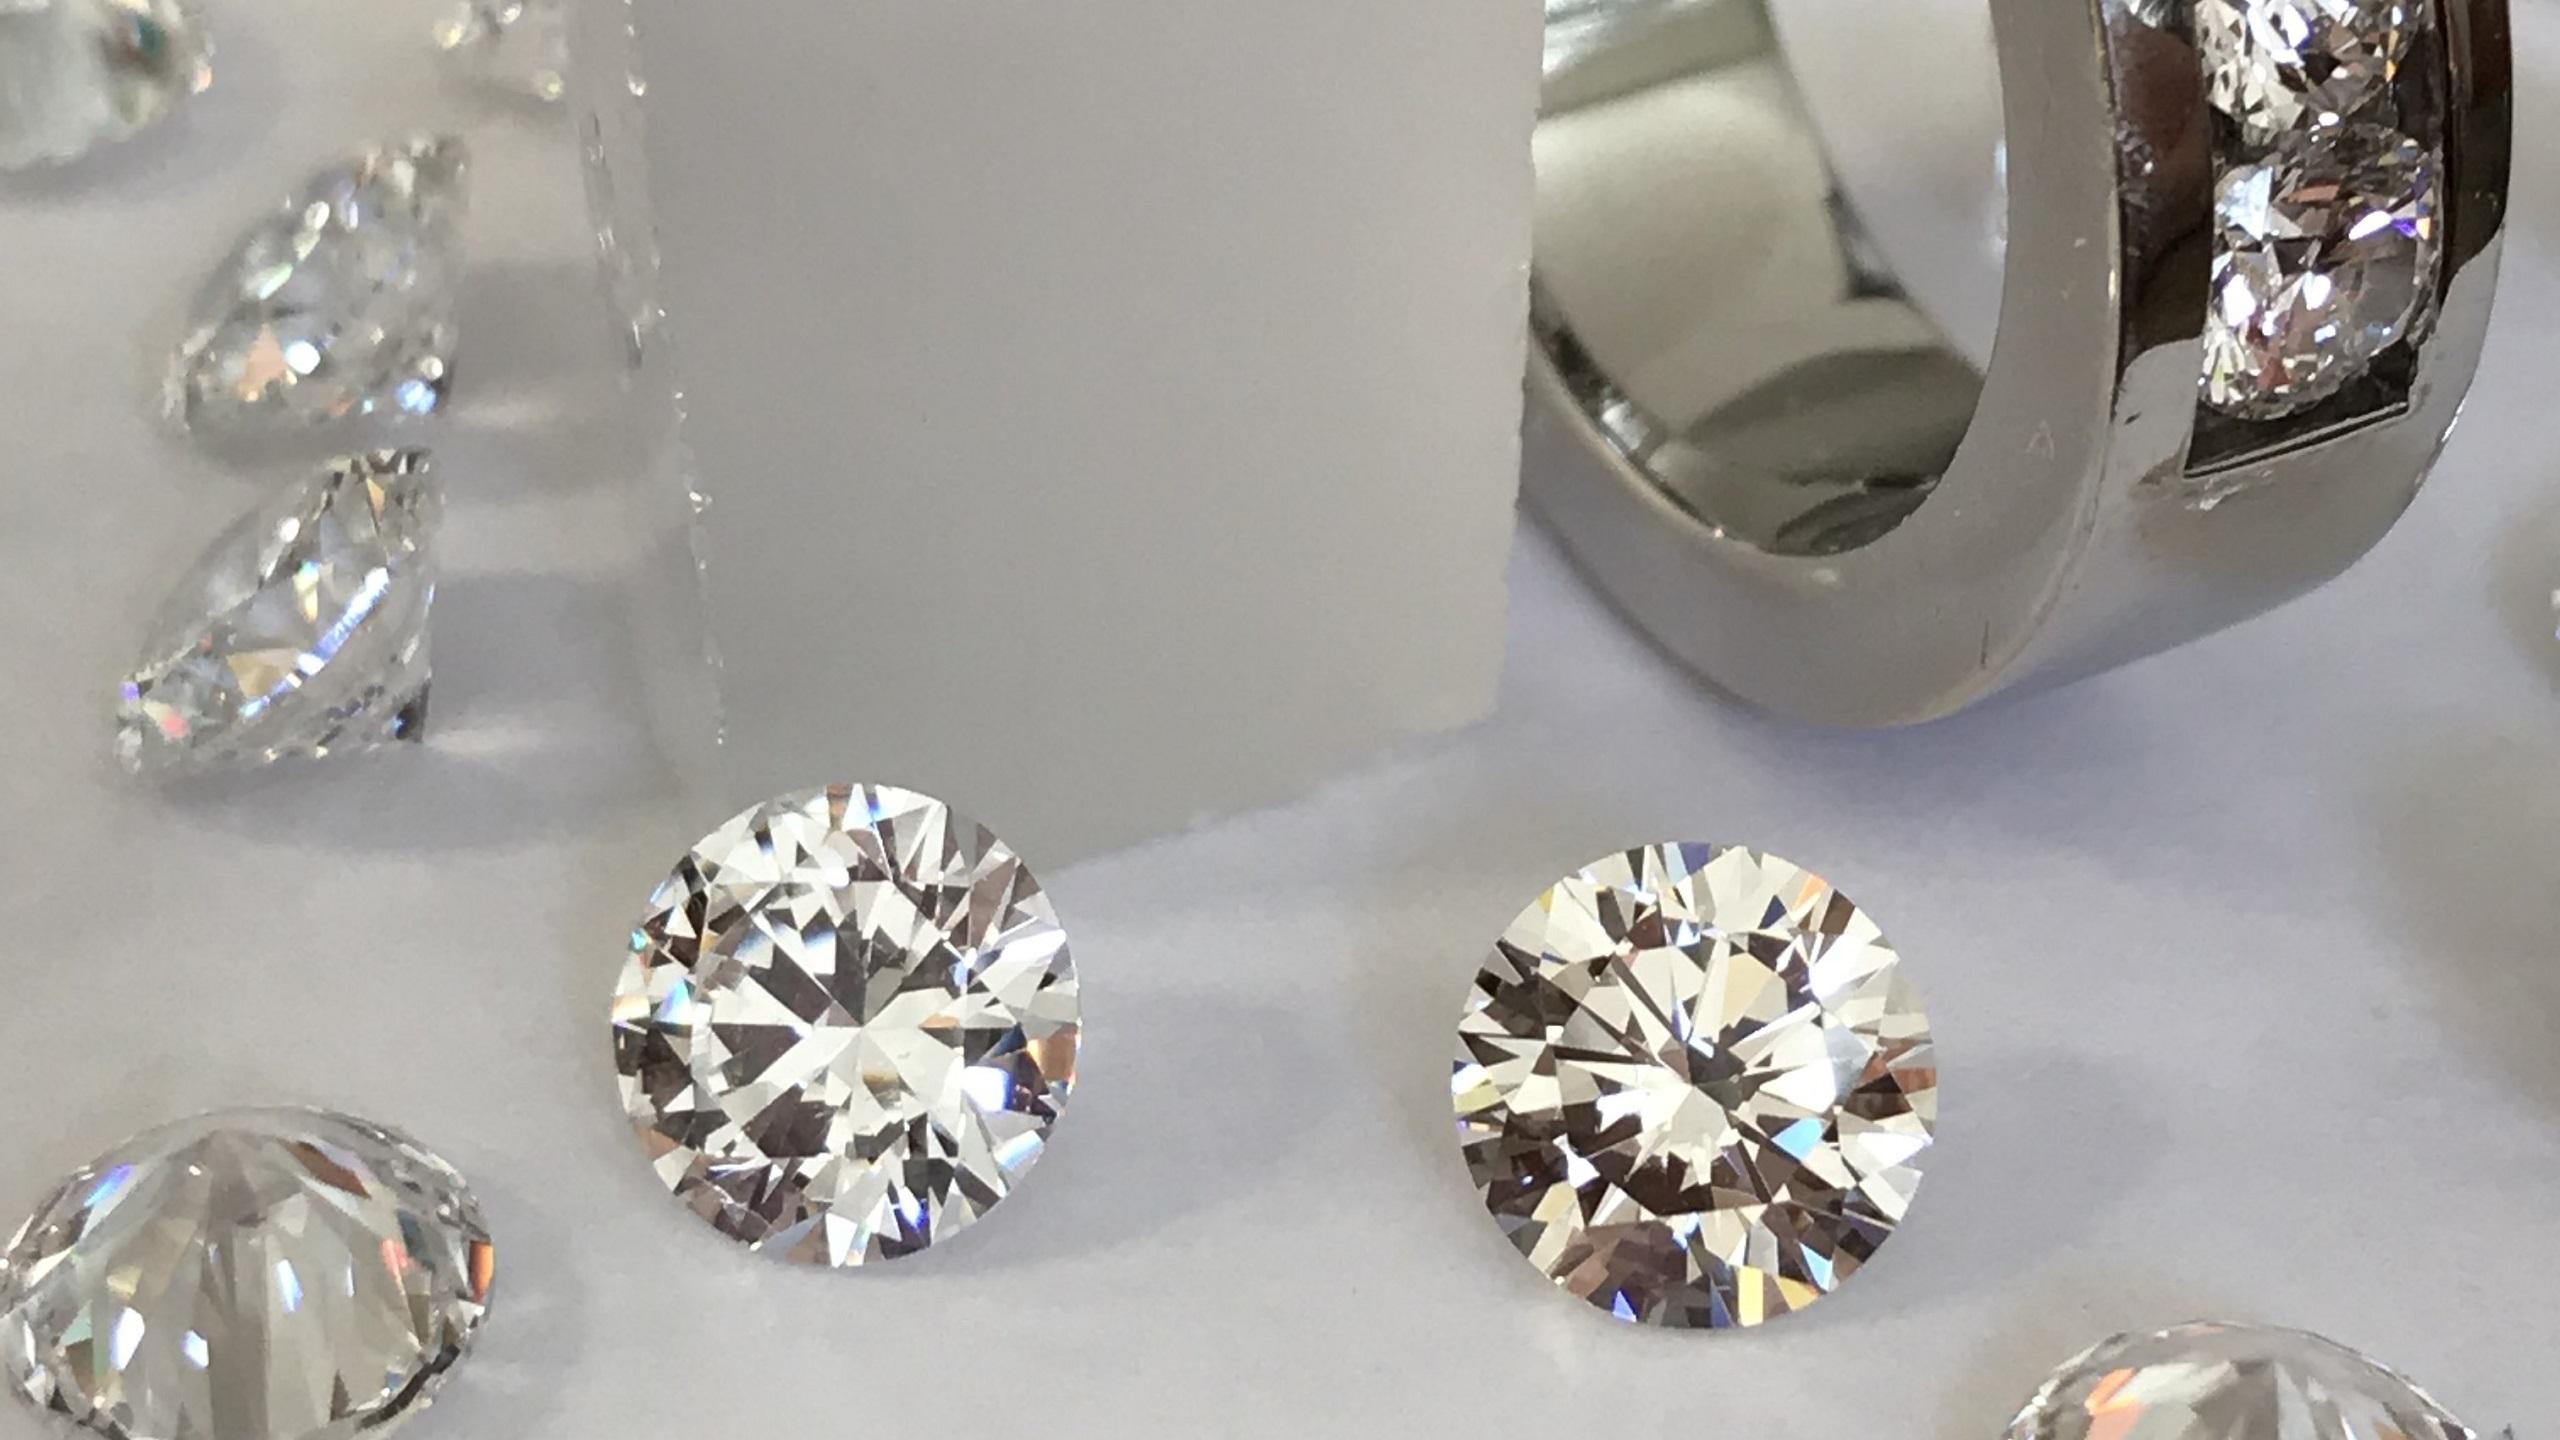 benzgem-imitation-diamond-pictured-on-the-right.jpeg